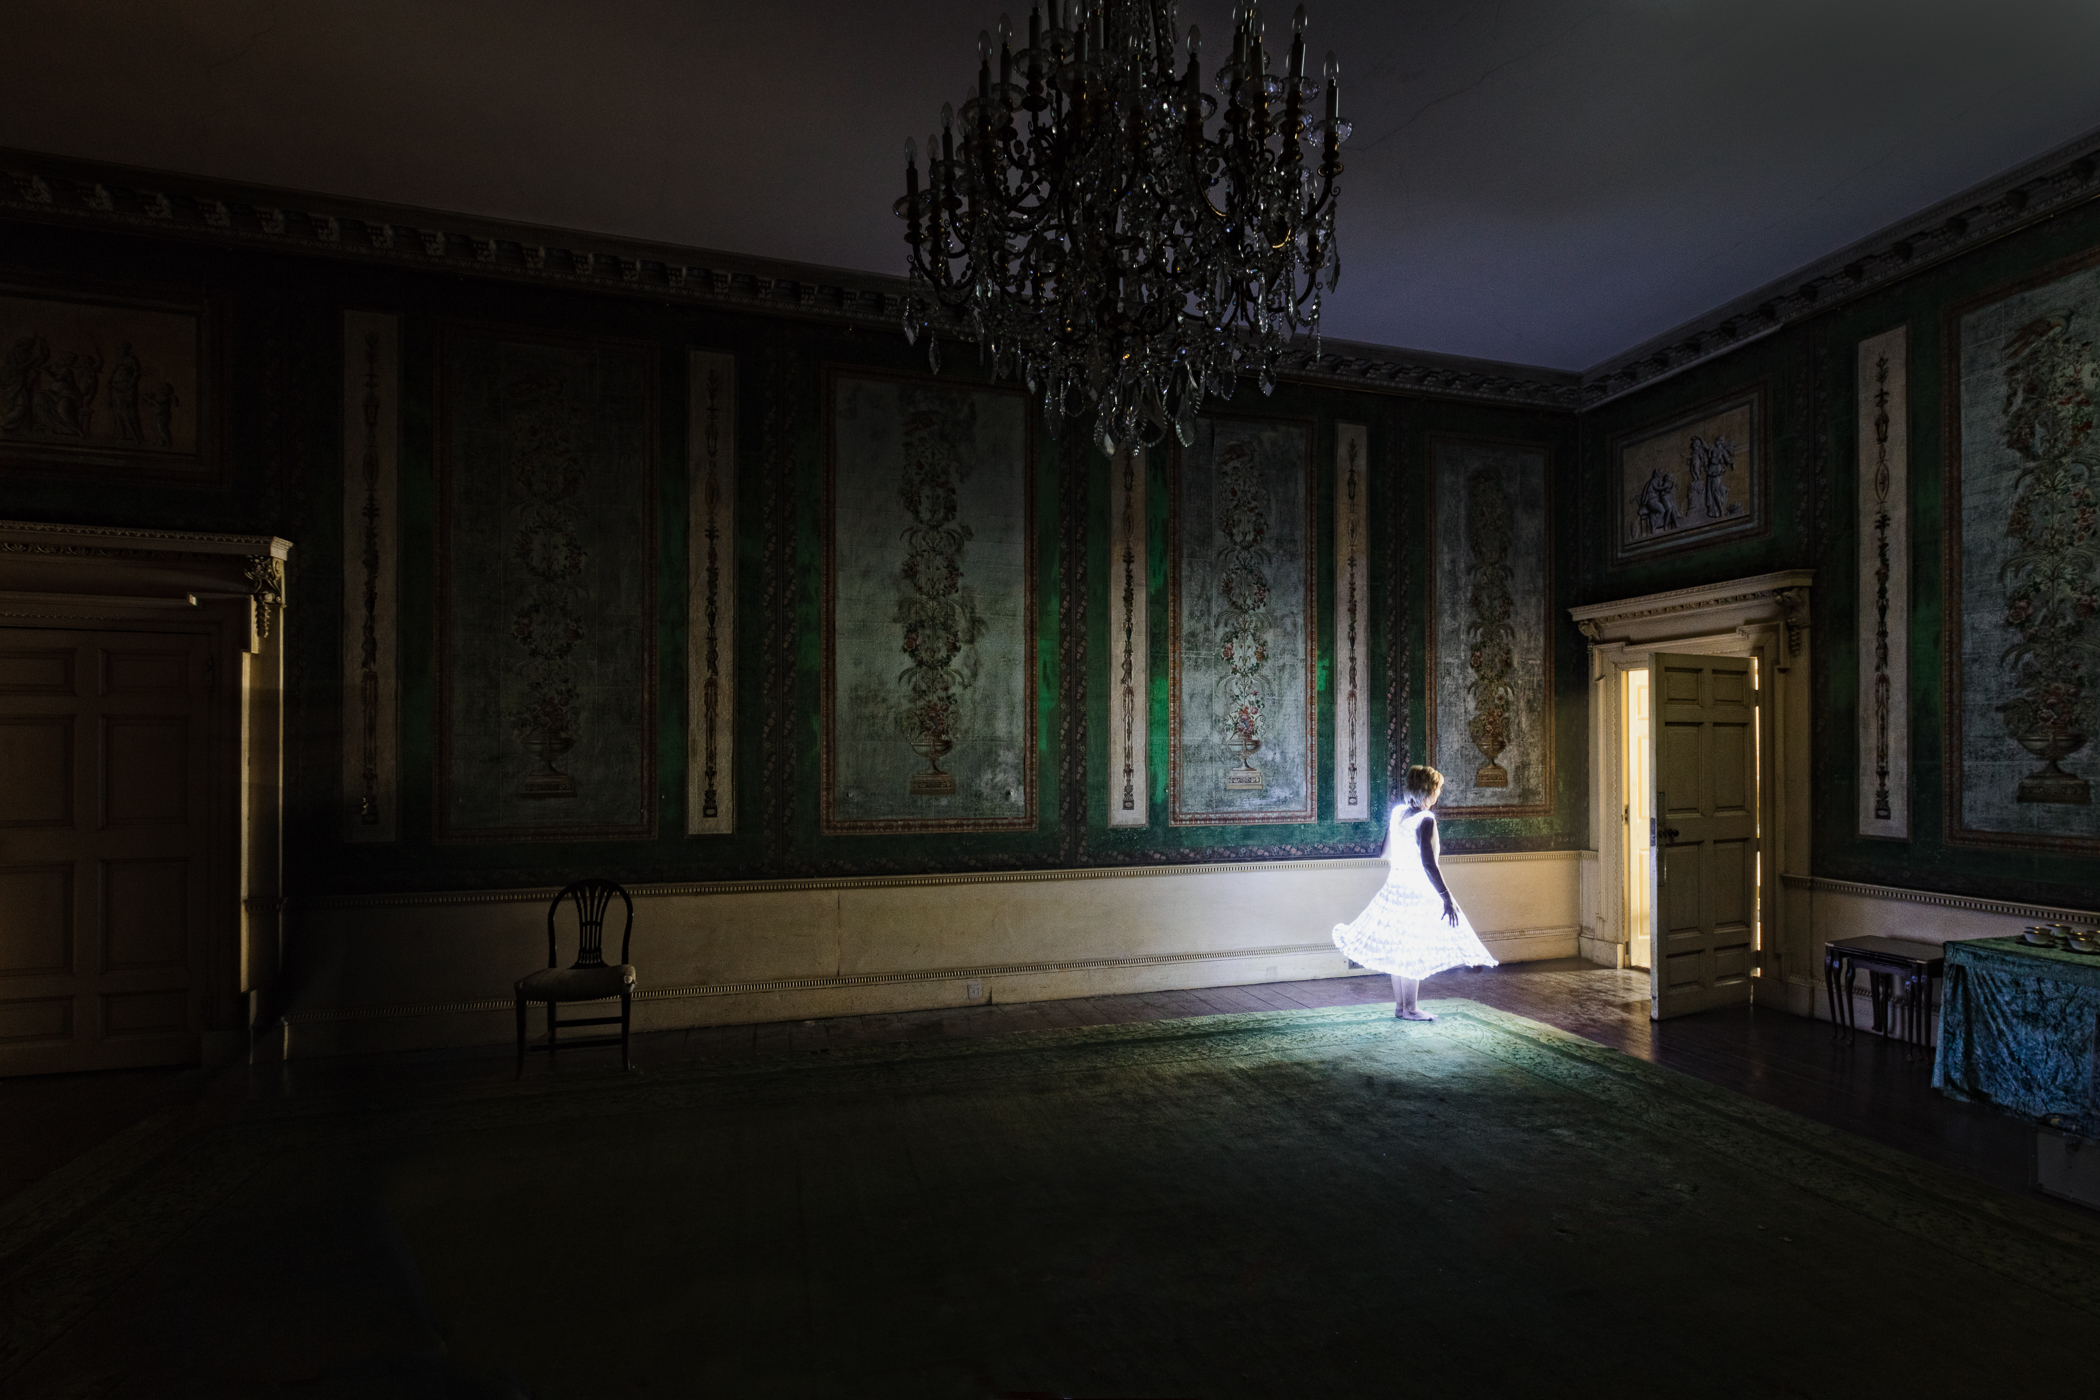 © Adrien Broom, The Green Room.